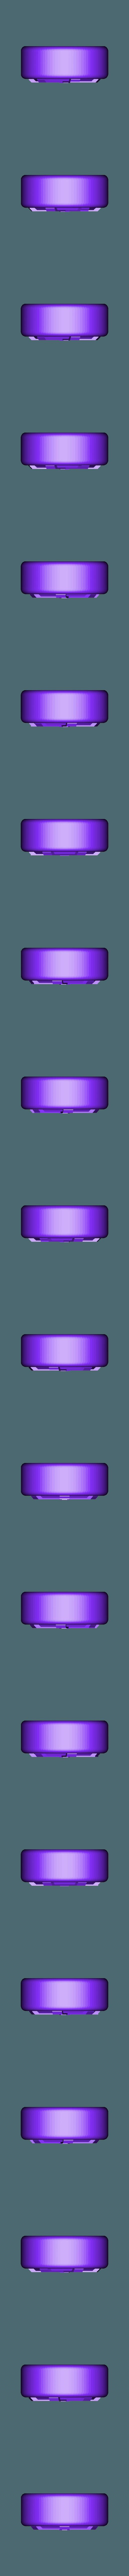 Wheel.stl Download free STL file Tesla Cybertruck Christmas Ornament • 3D printable template, Desktop_Makes